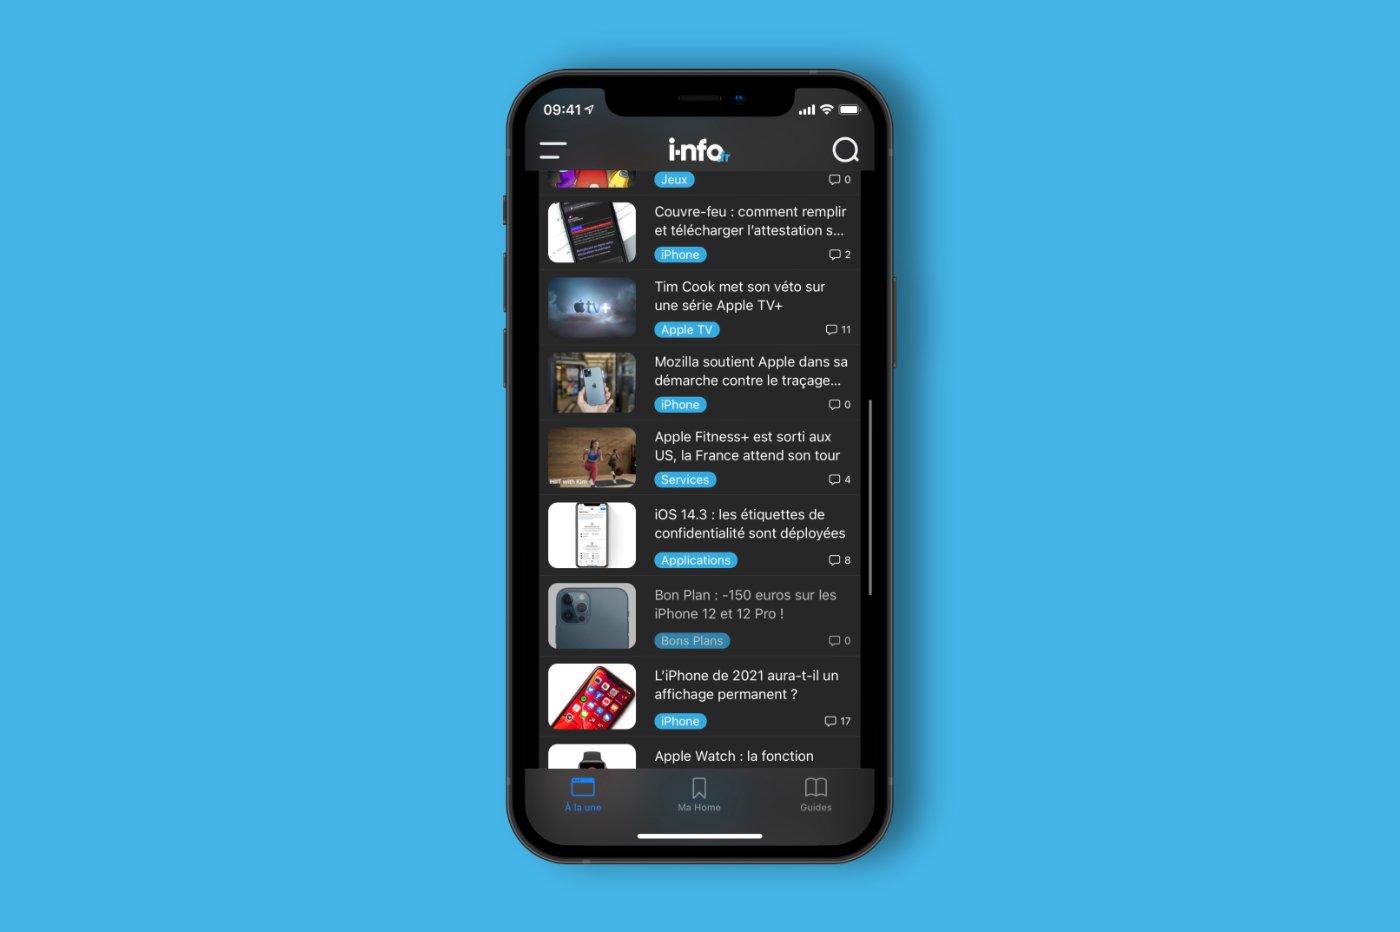 app i-nfo.fr sur iPhone Face ID